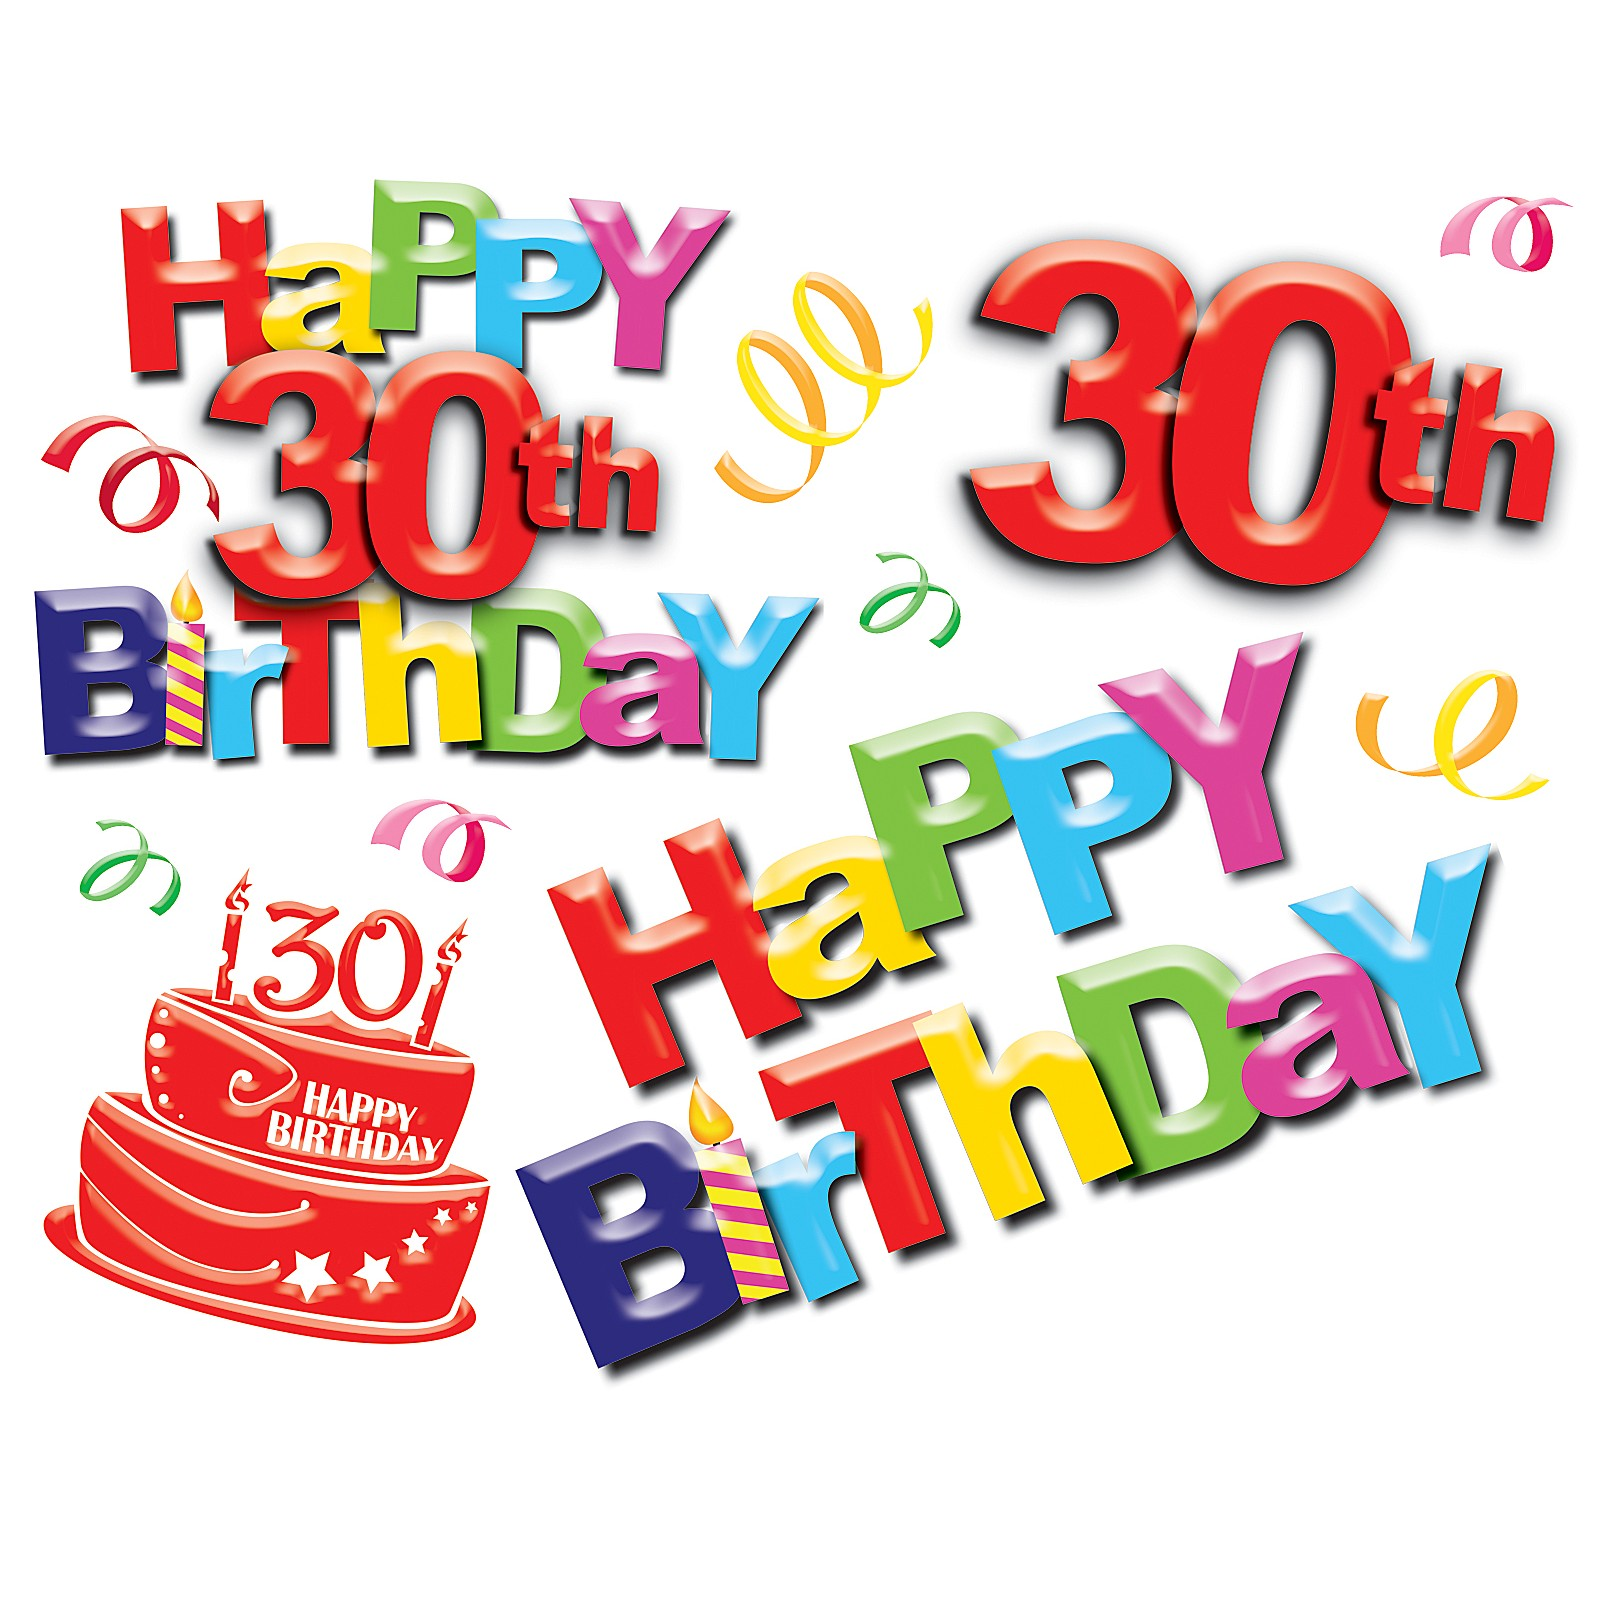 Unique Gifts Ideas 30th Birthday Birthday